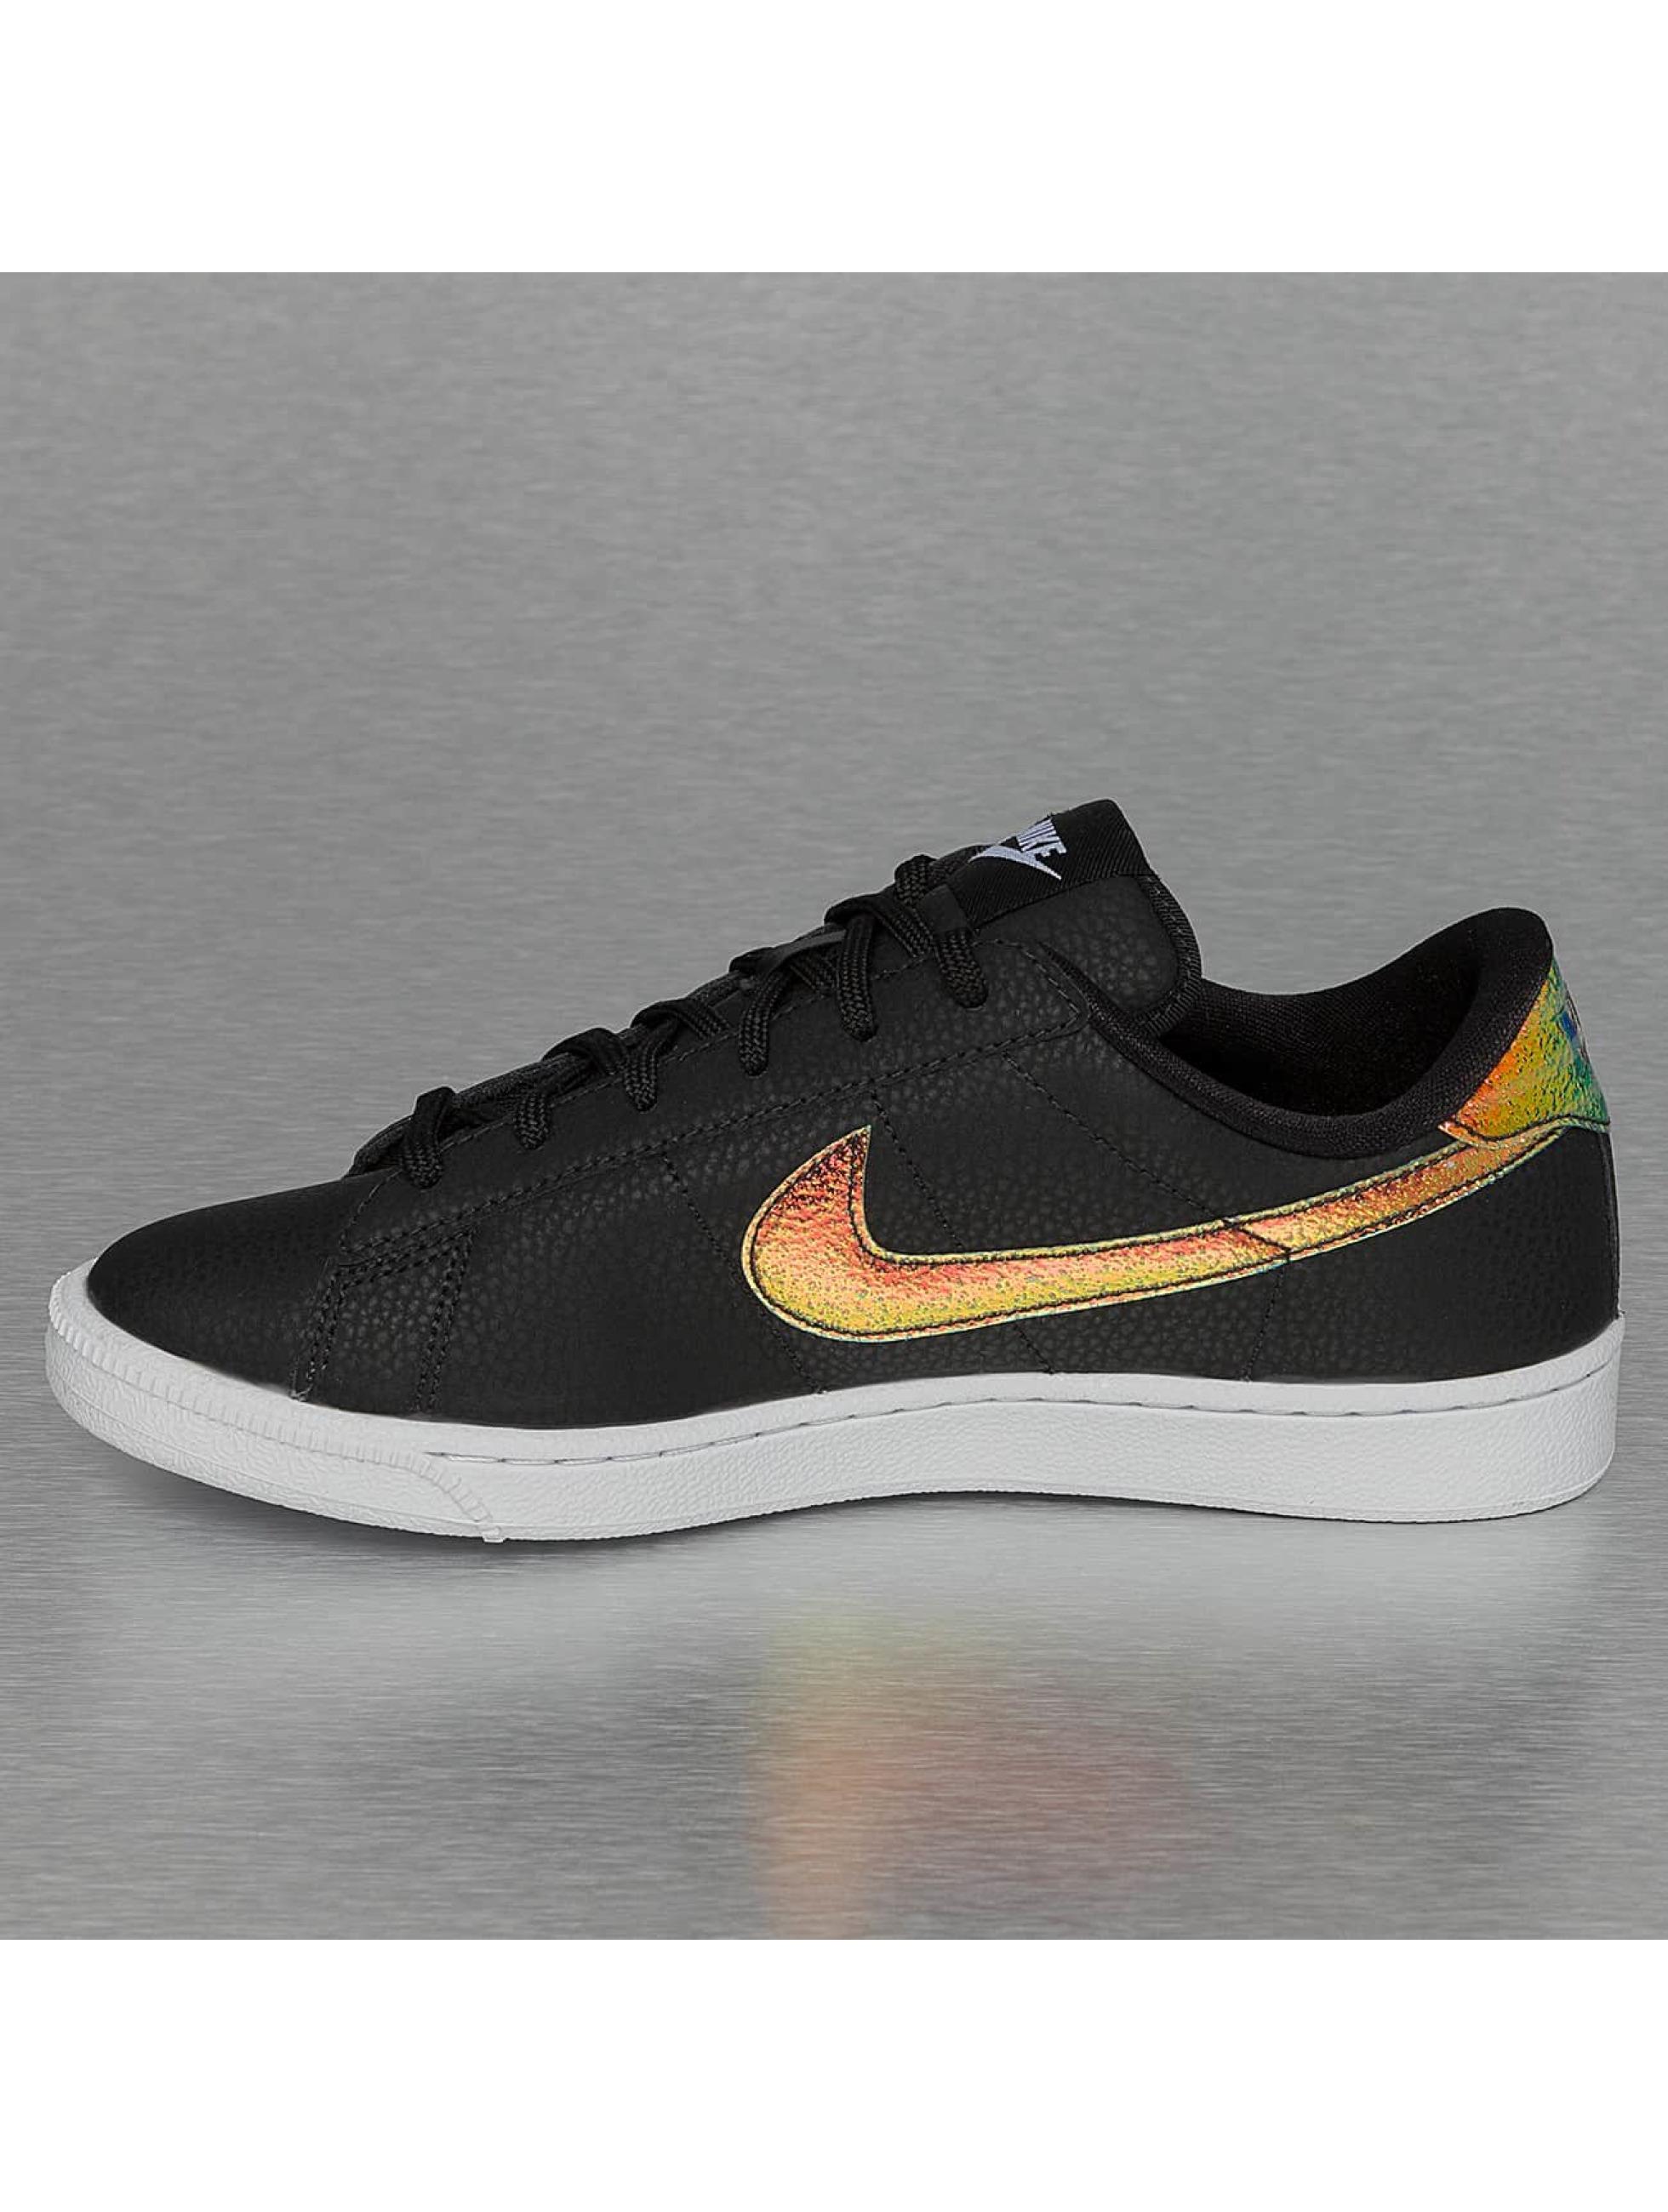 Nike Sneakers WMNS Tennis Classic PRM black